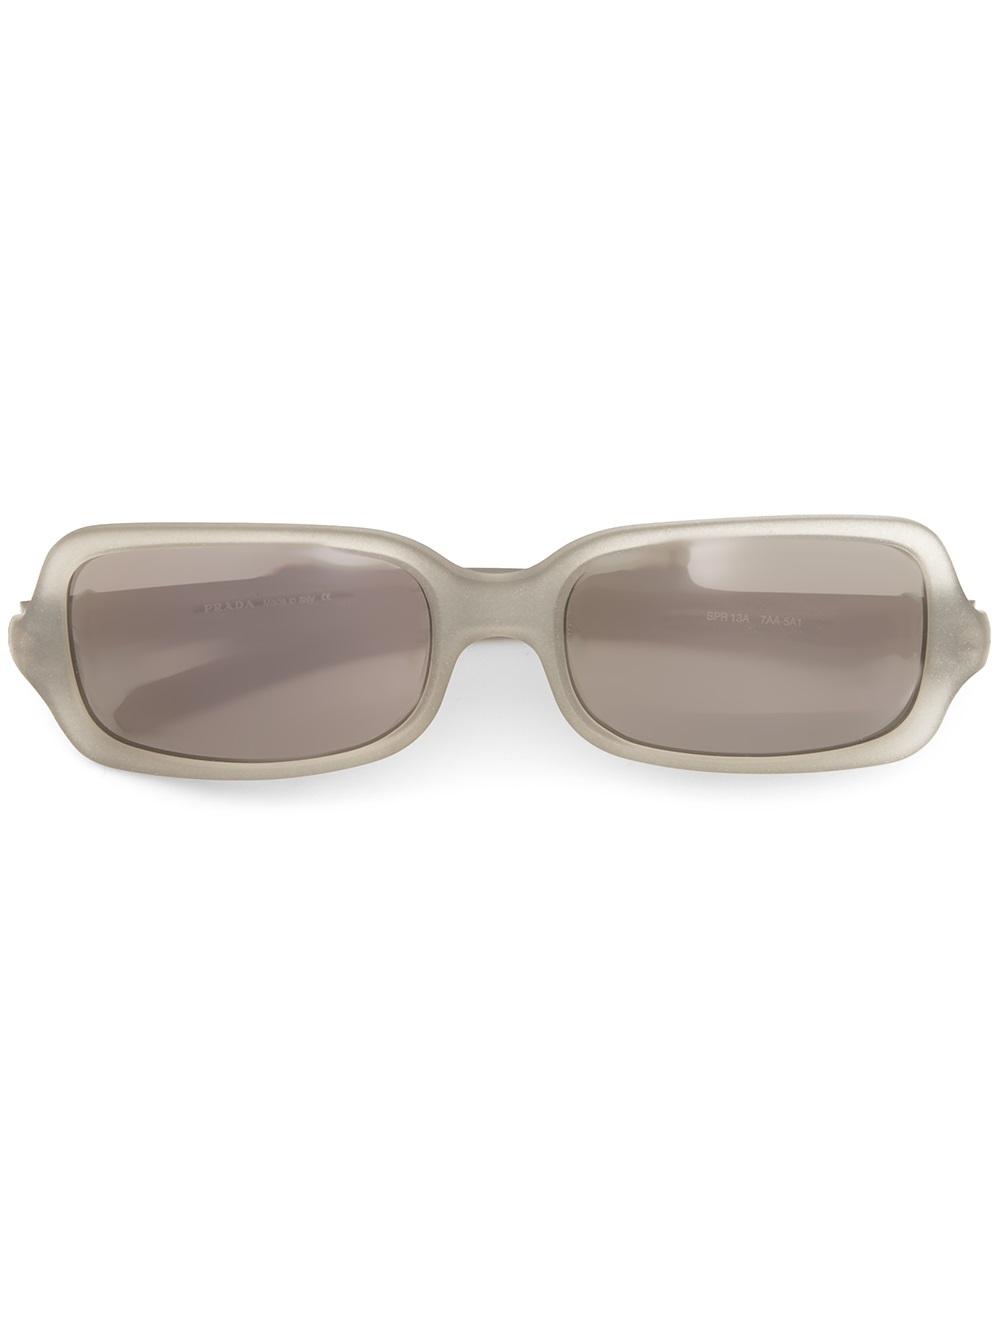 b0b9aa8722 ... good sweden lyst prada rectangular frame sunglasses in gray aa351 7a13a  f9f8b 61ac5